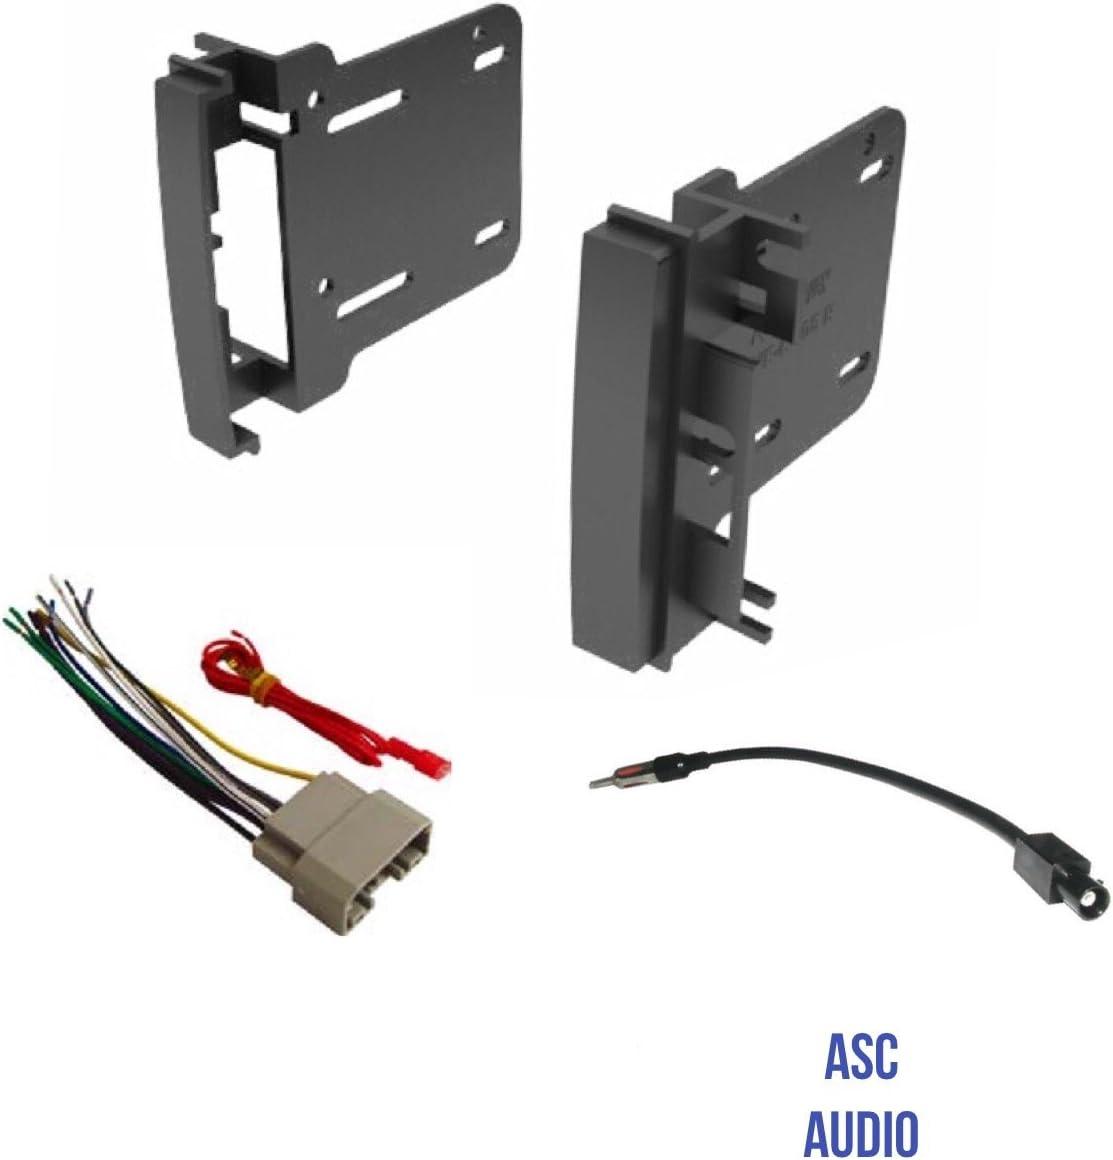 International Trucks Car Stereo Wiring Harness Adapters Diagram Pioneer Radio Simplein Dash Mounting Kits Amazon Com